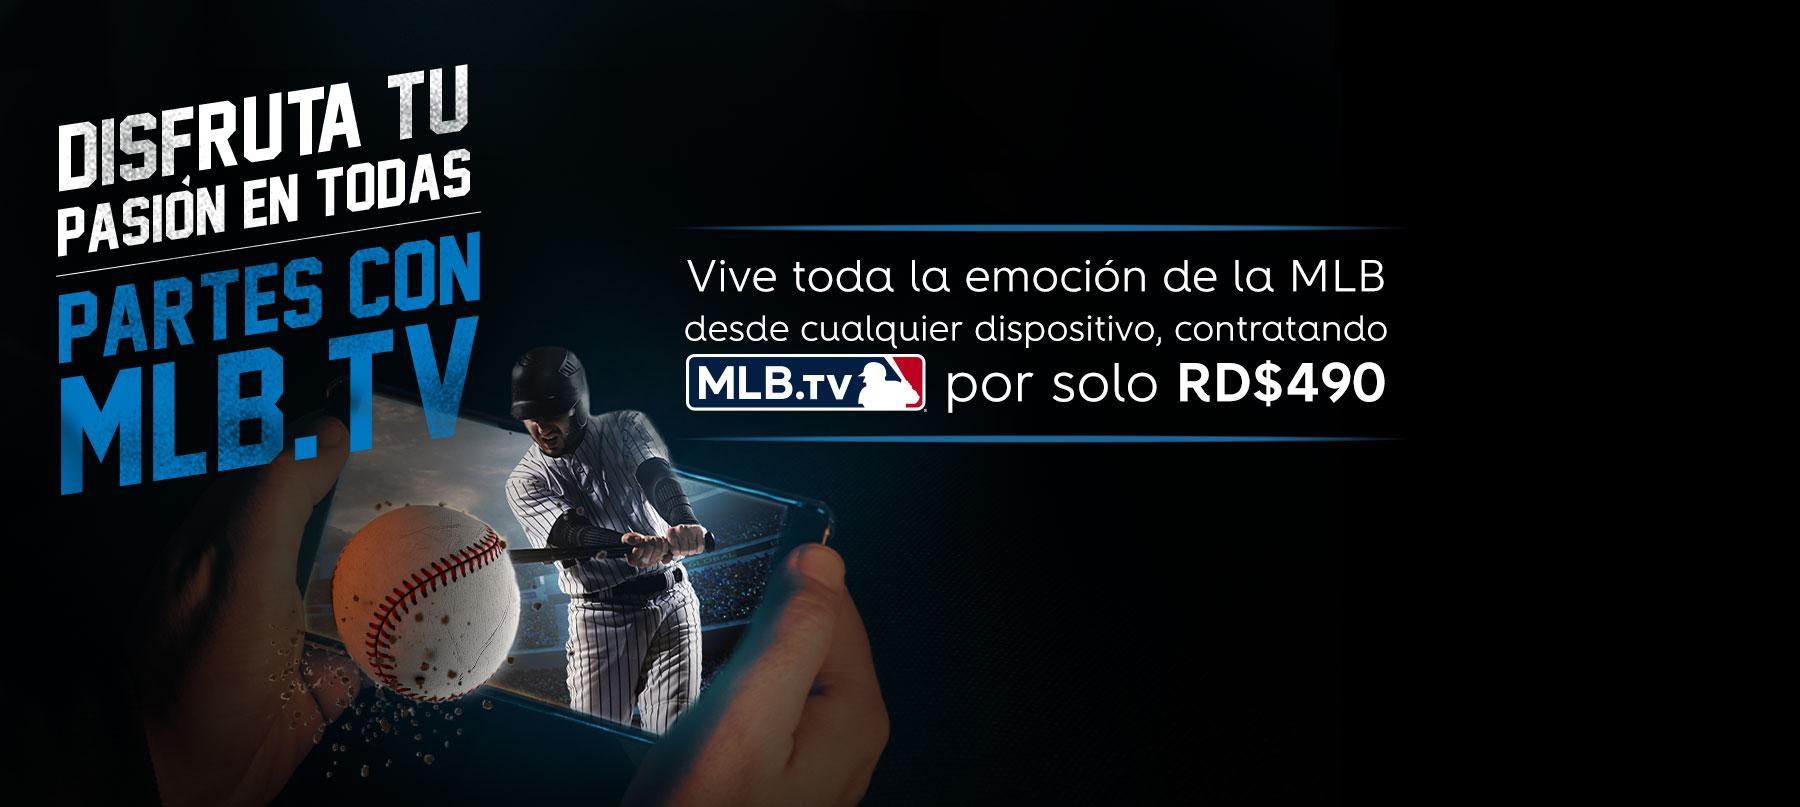 MLB Extra Innings / MLB TV   Altice